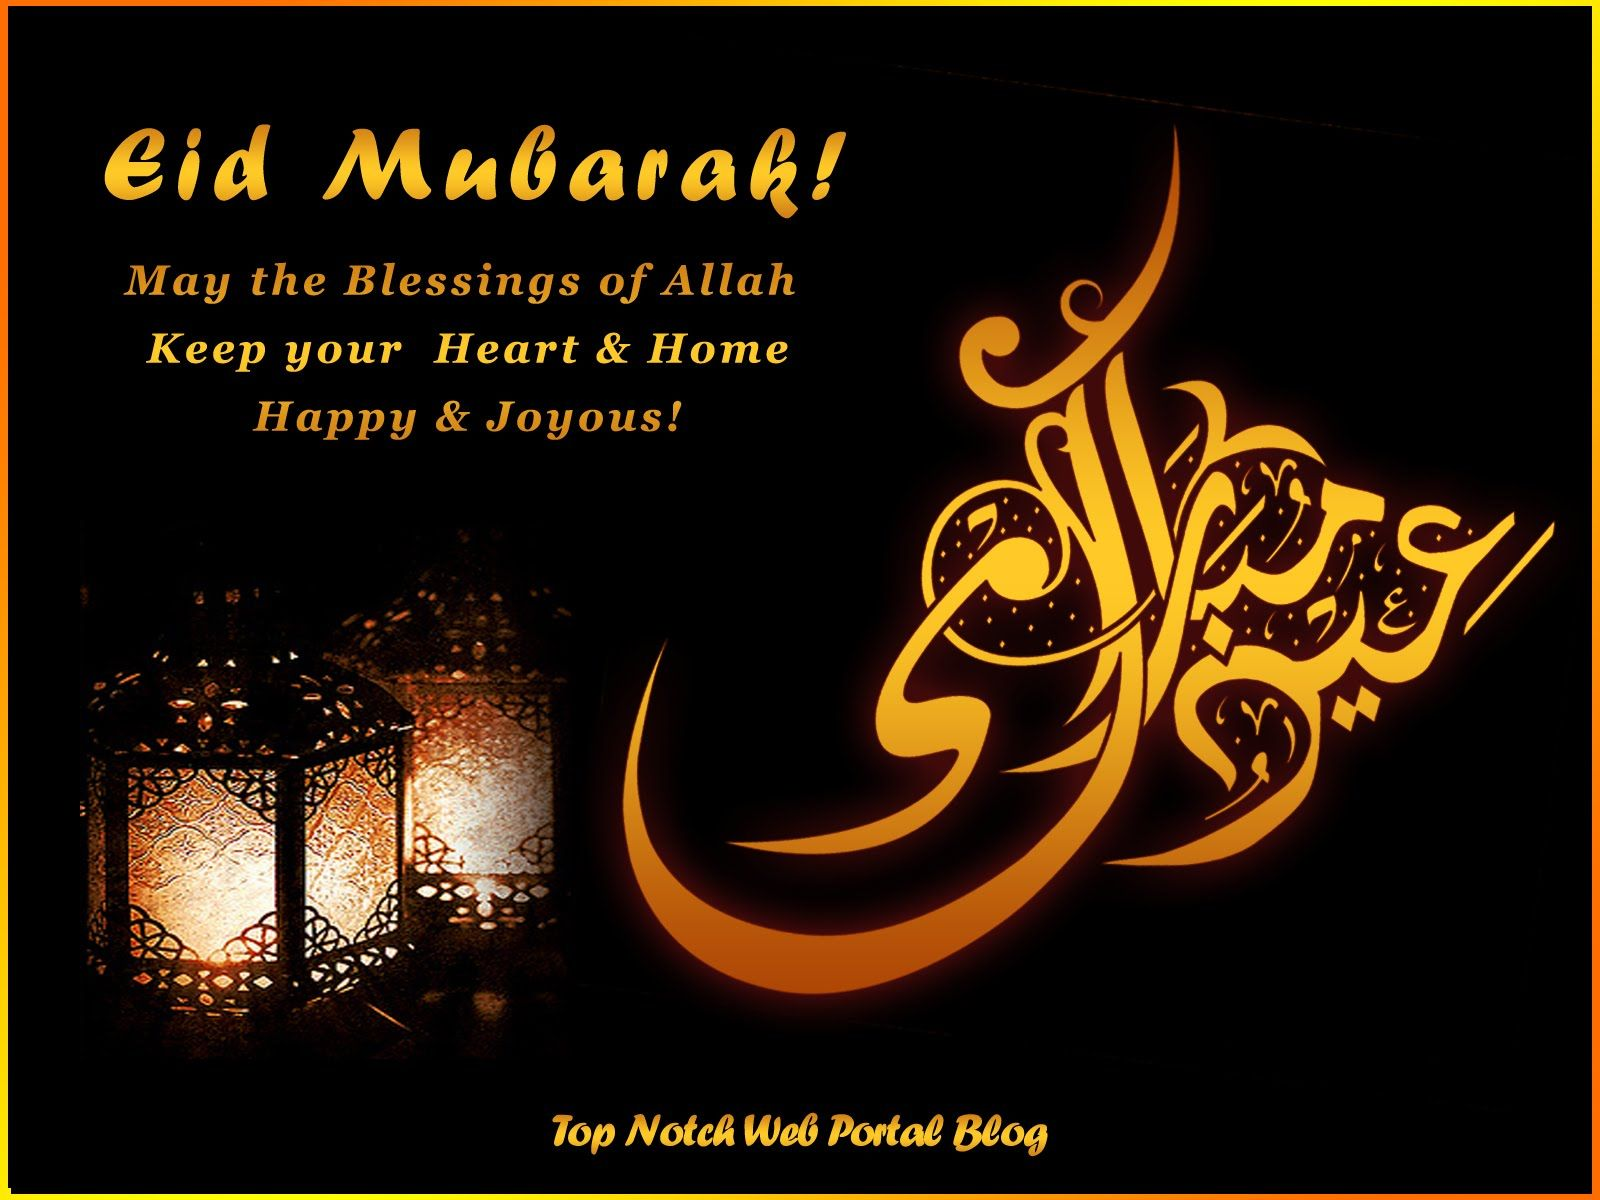 17 Best ideas about Best Eid Wishes on Pinterest | Happy eid ...